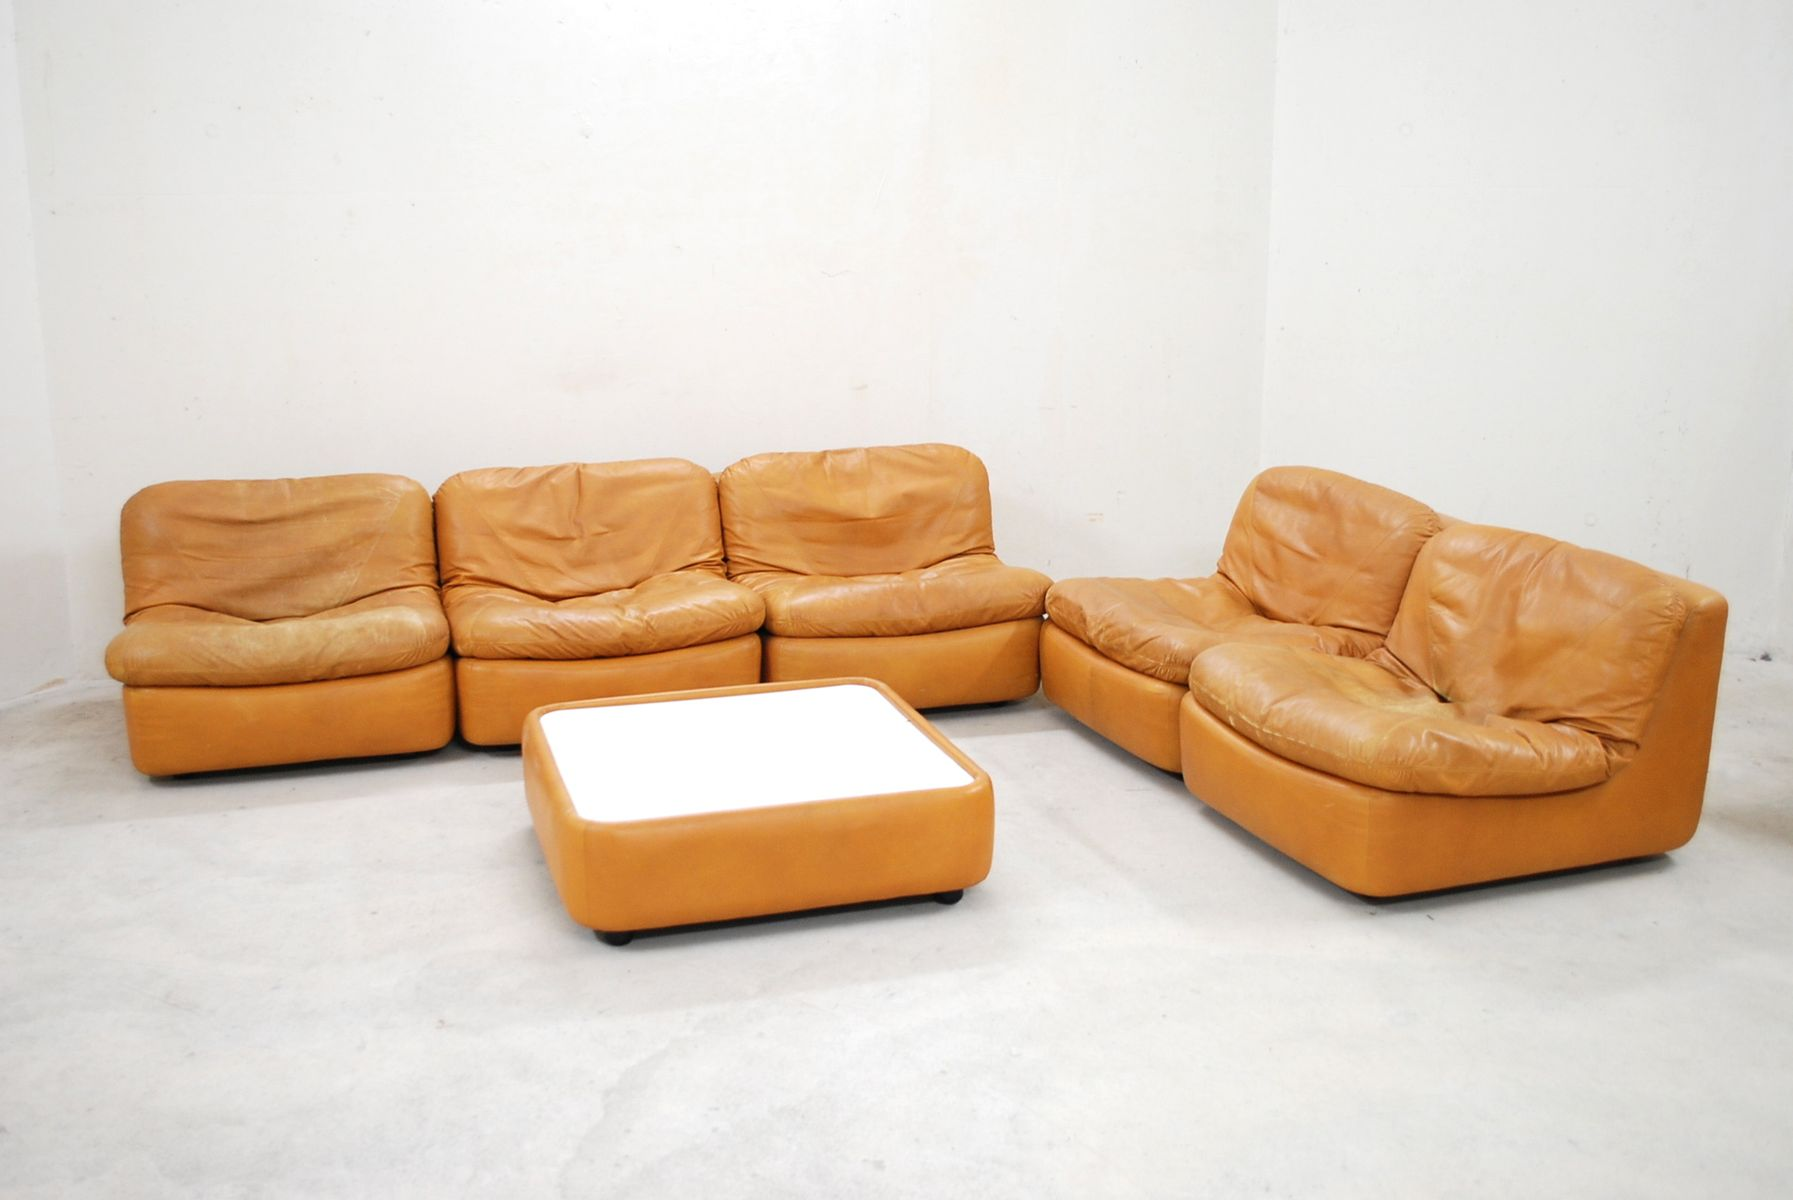 vintage modular cognac leather living room set from